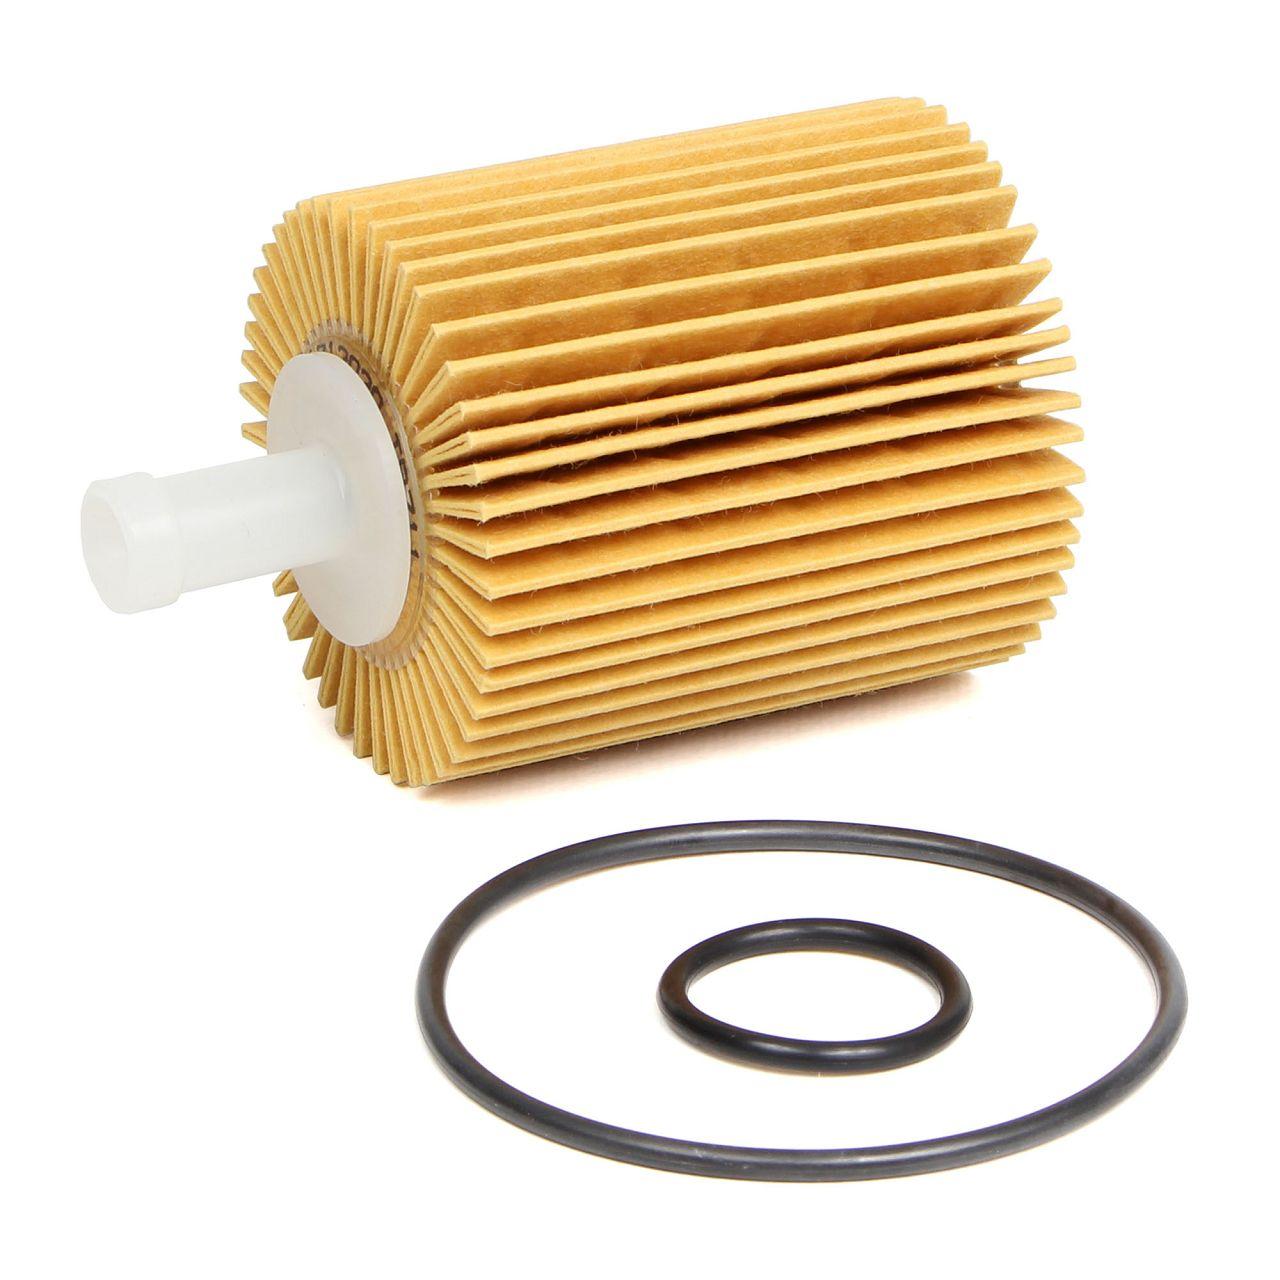 HERTH+BUSS JAKOPARTS Filterpaket Filterset für TOYOTA AVENSIS VERSO 2.0/2.2 D-4D